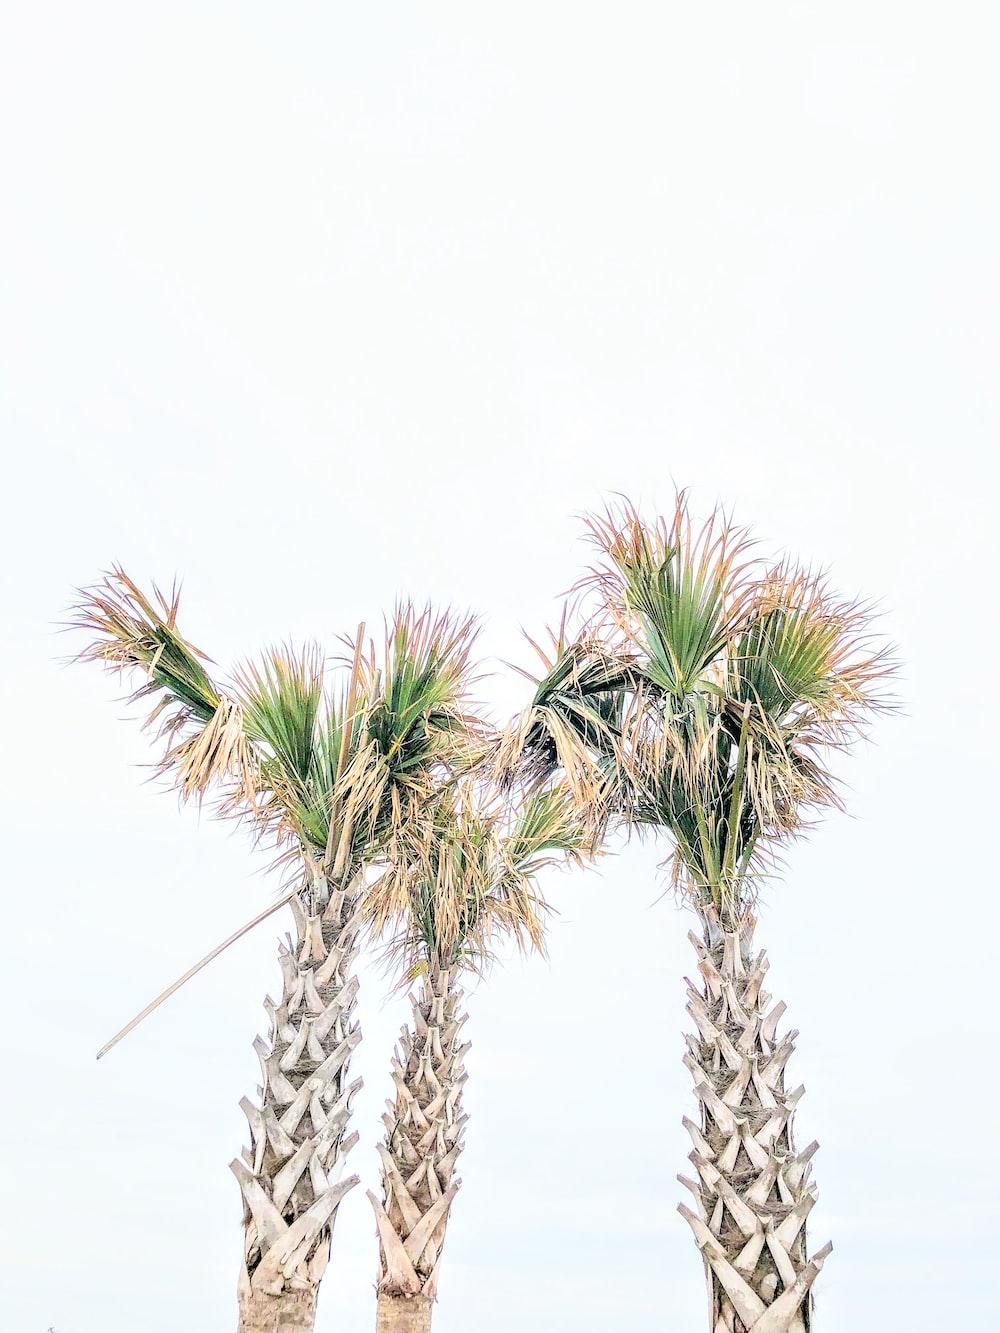 three green linear-leafed plants